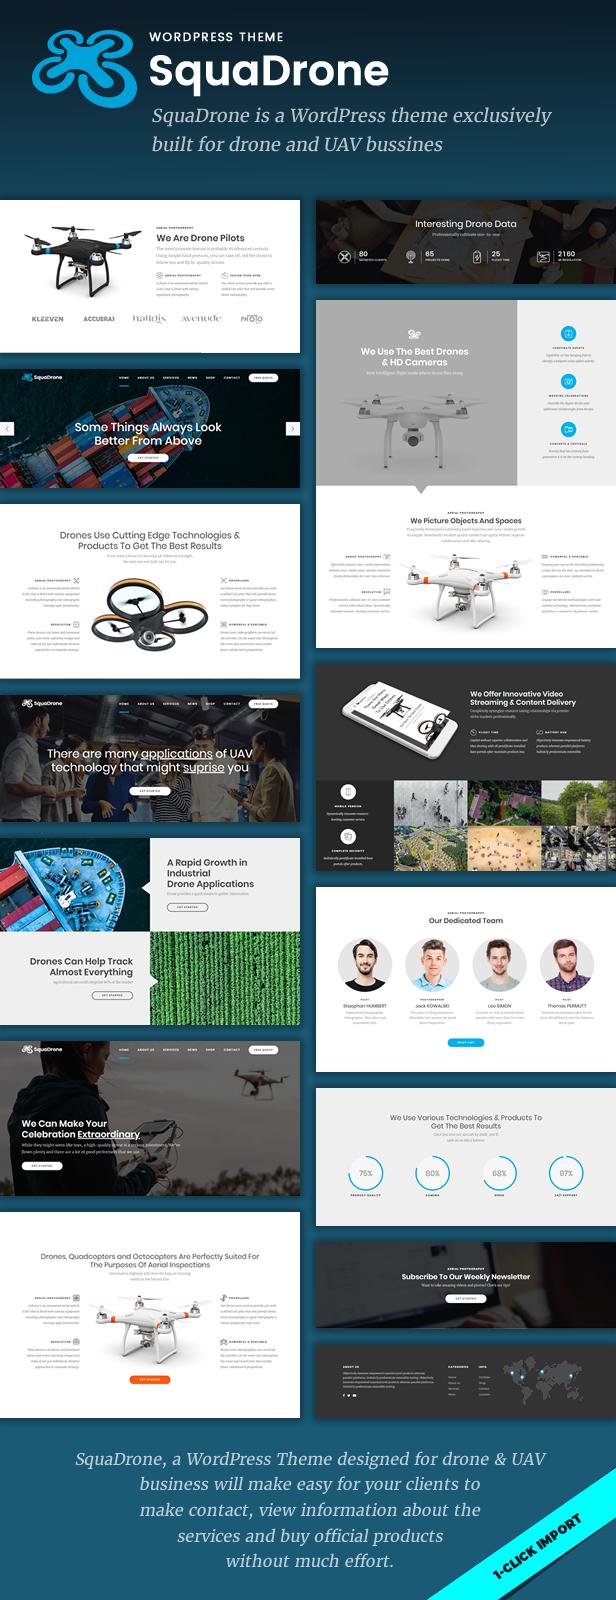 SquaDrone - Drone & UAV Business WordPress Theme - 1